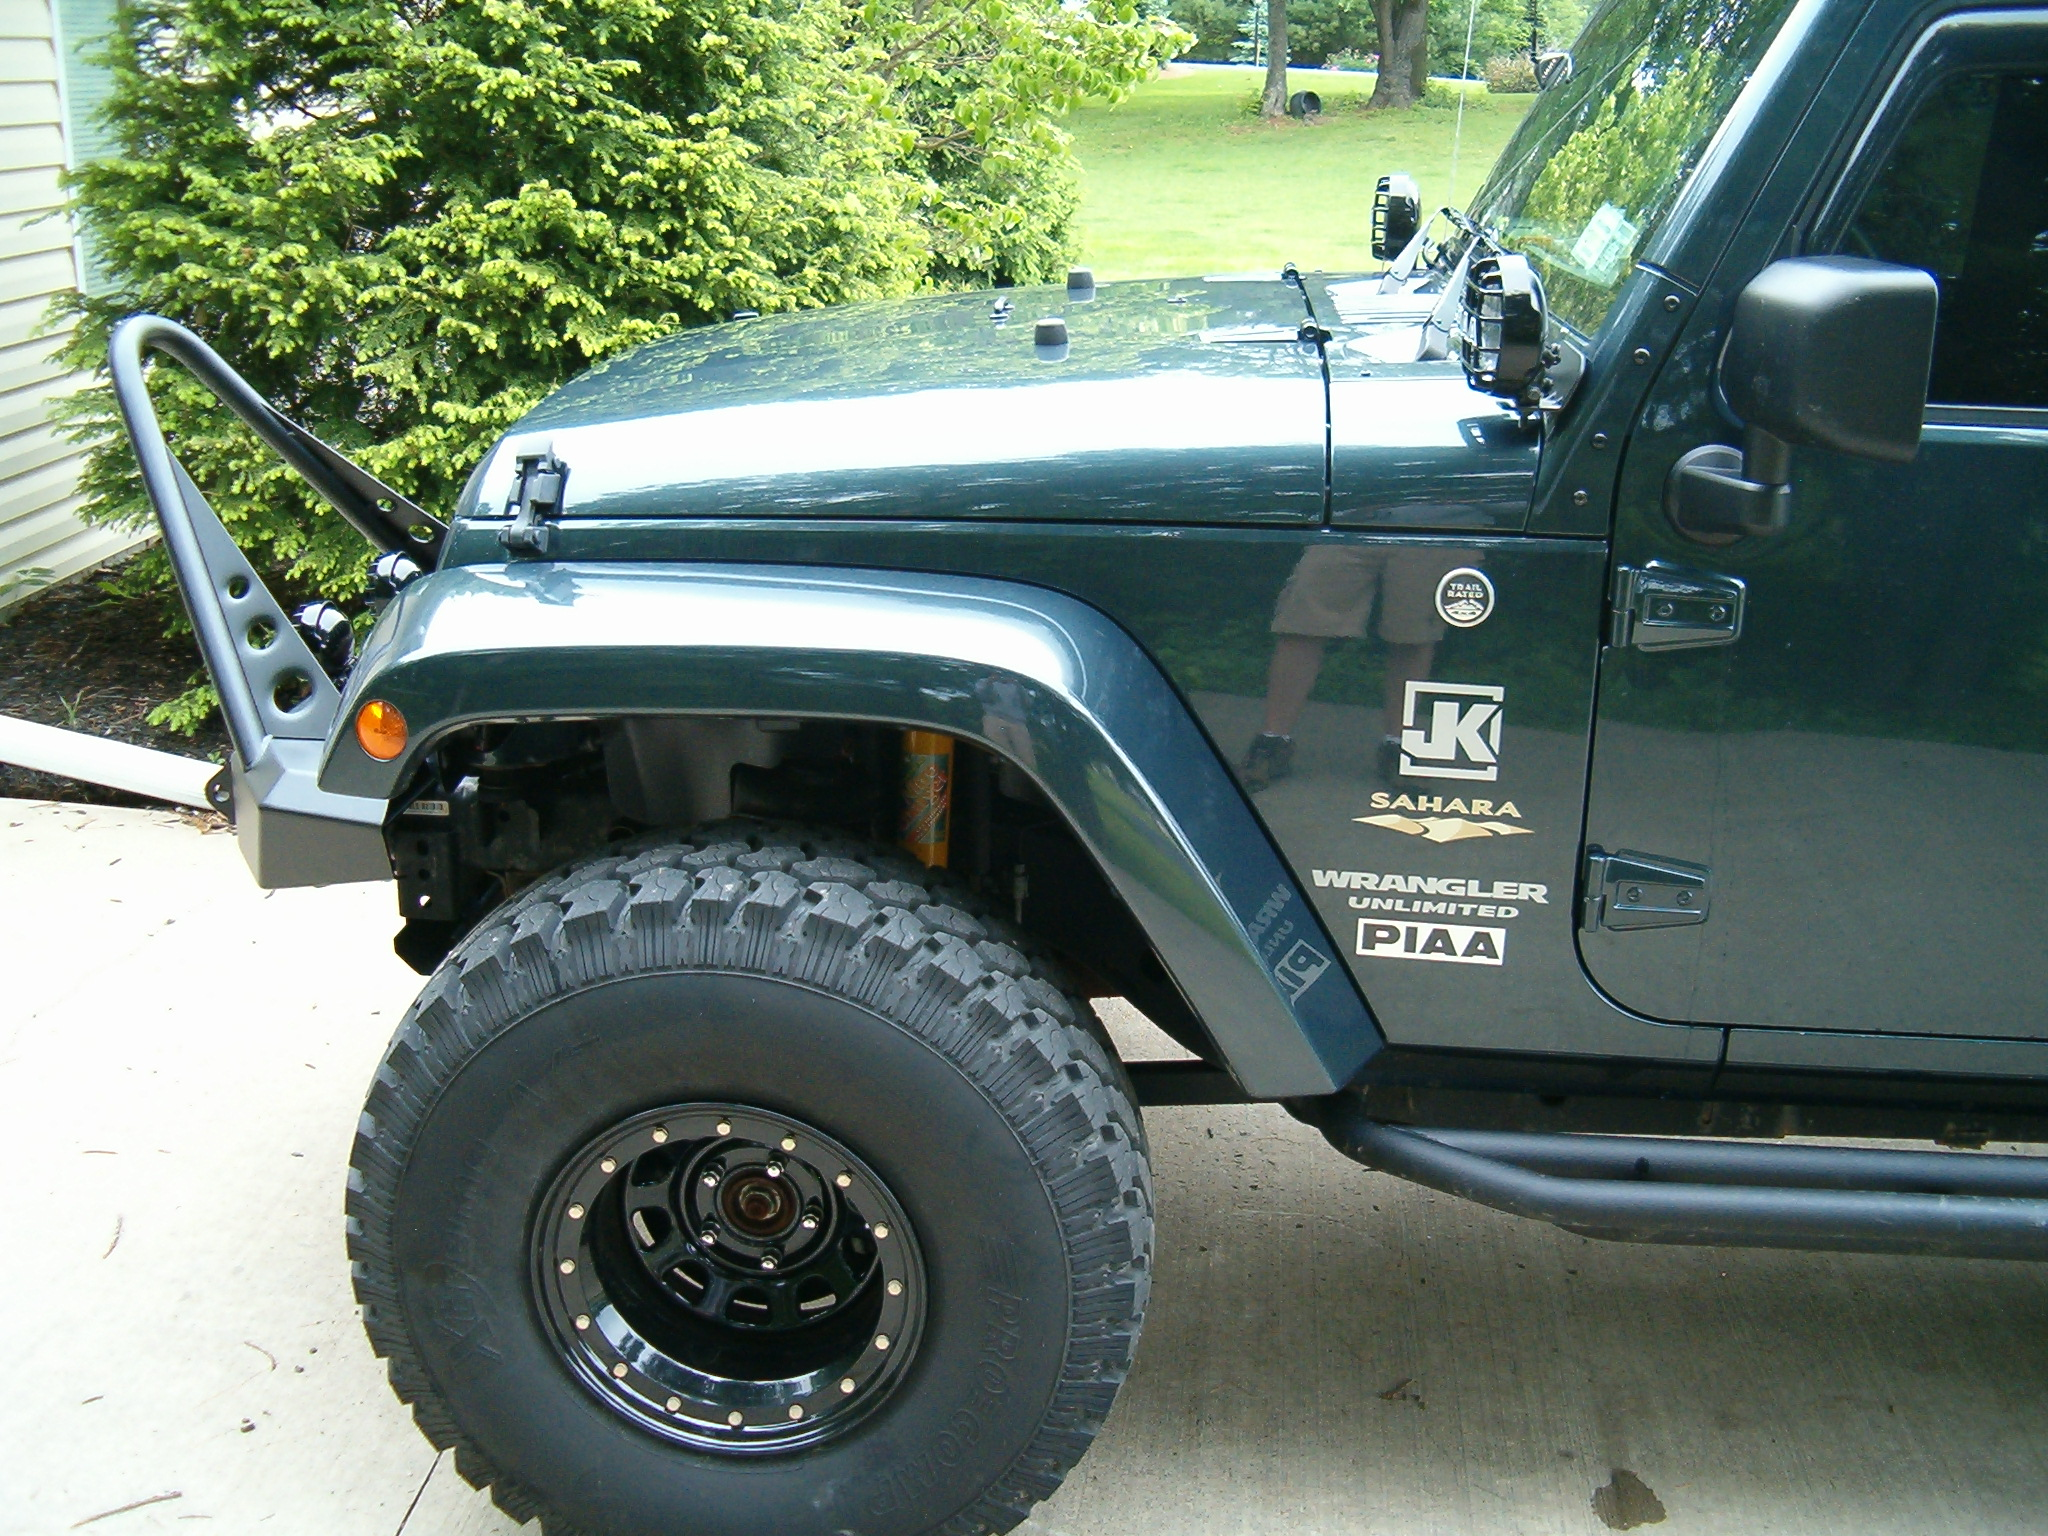 Jeep_0133.jpg